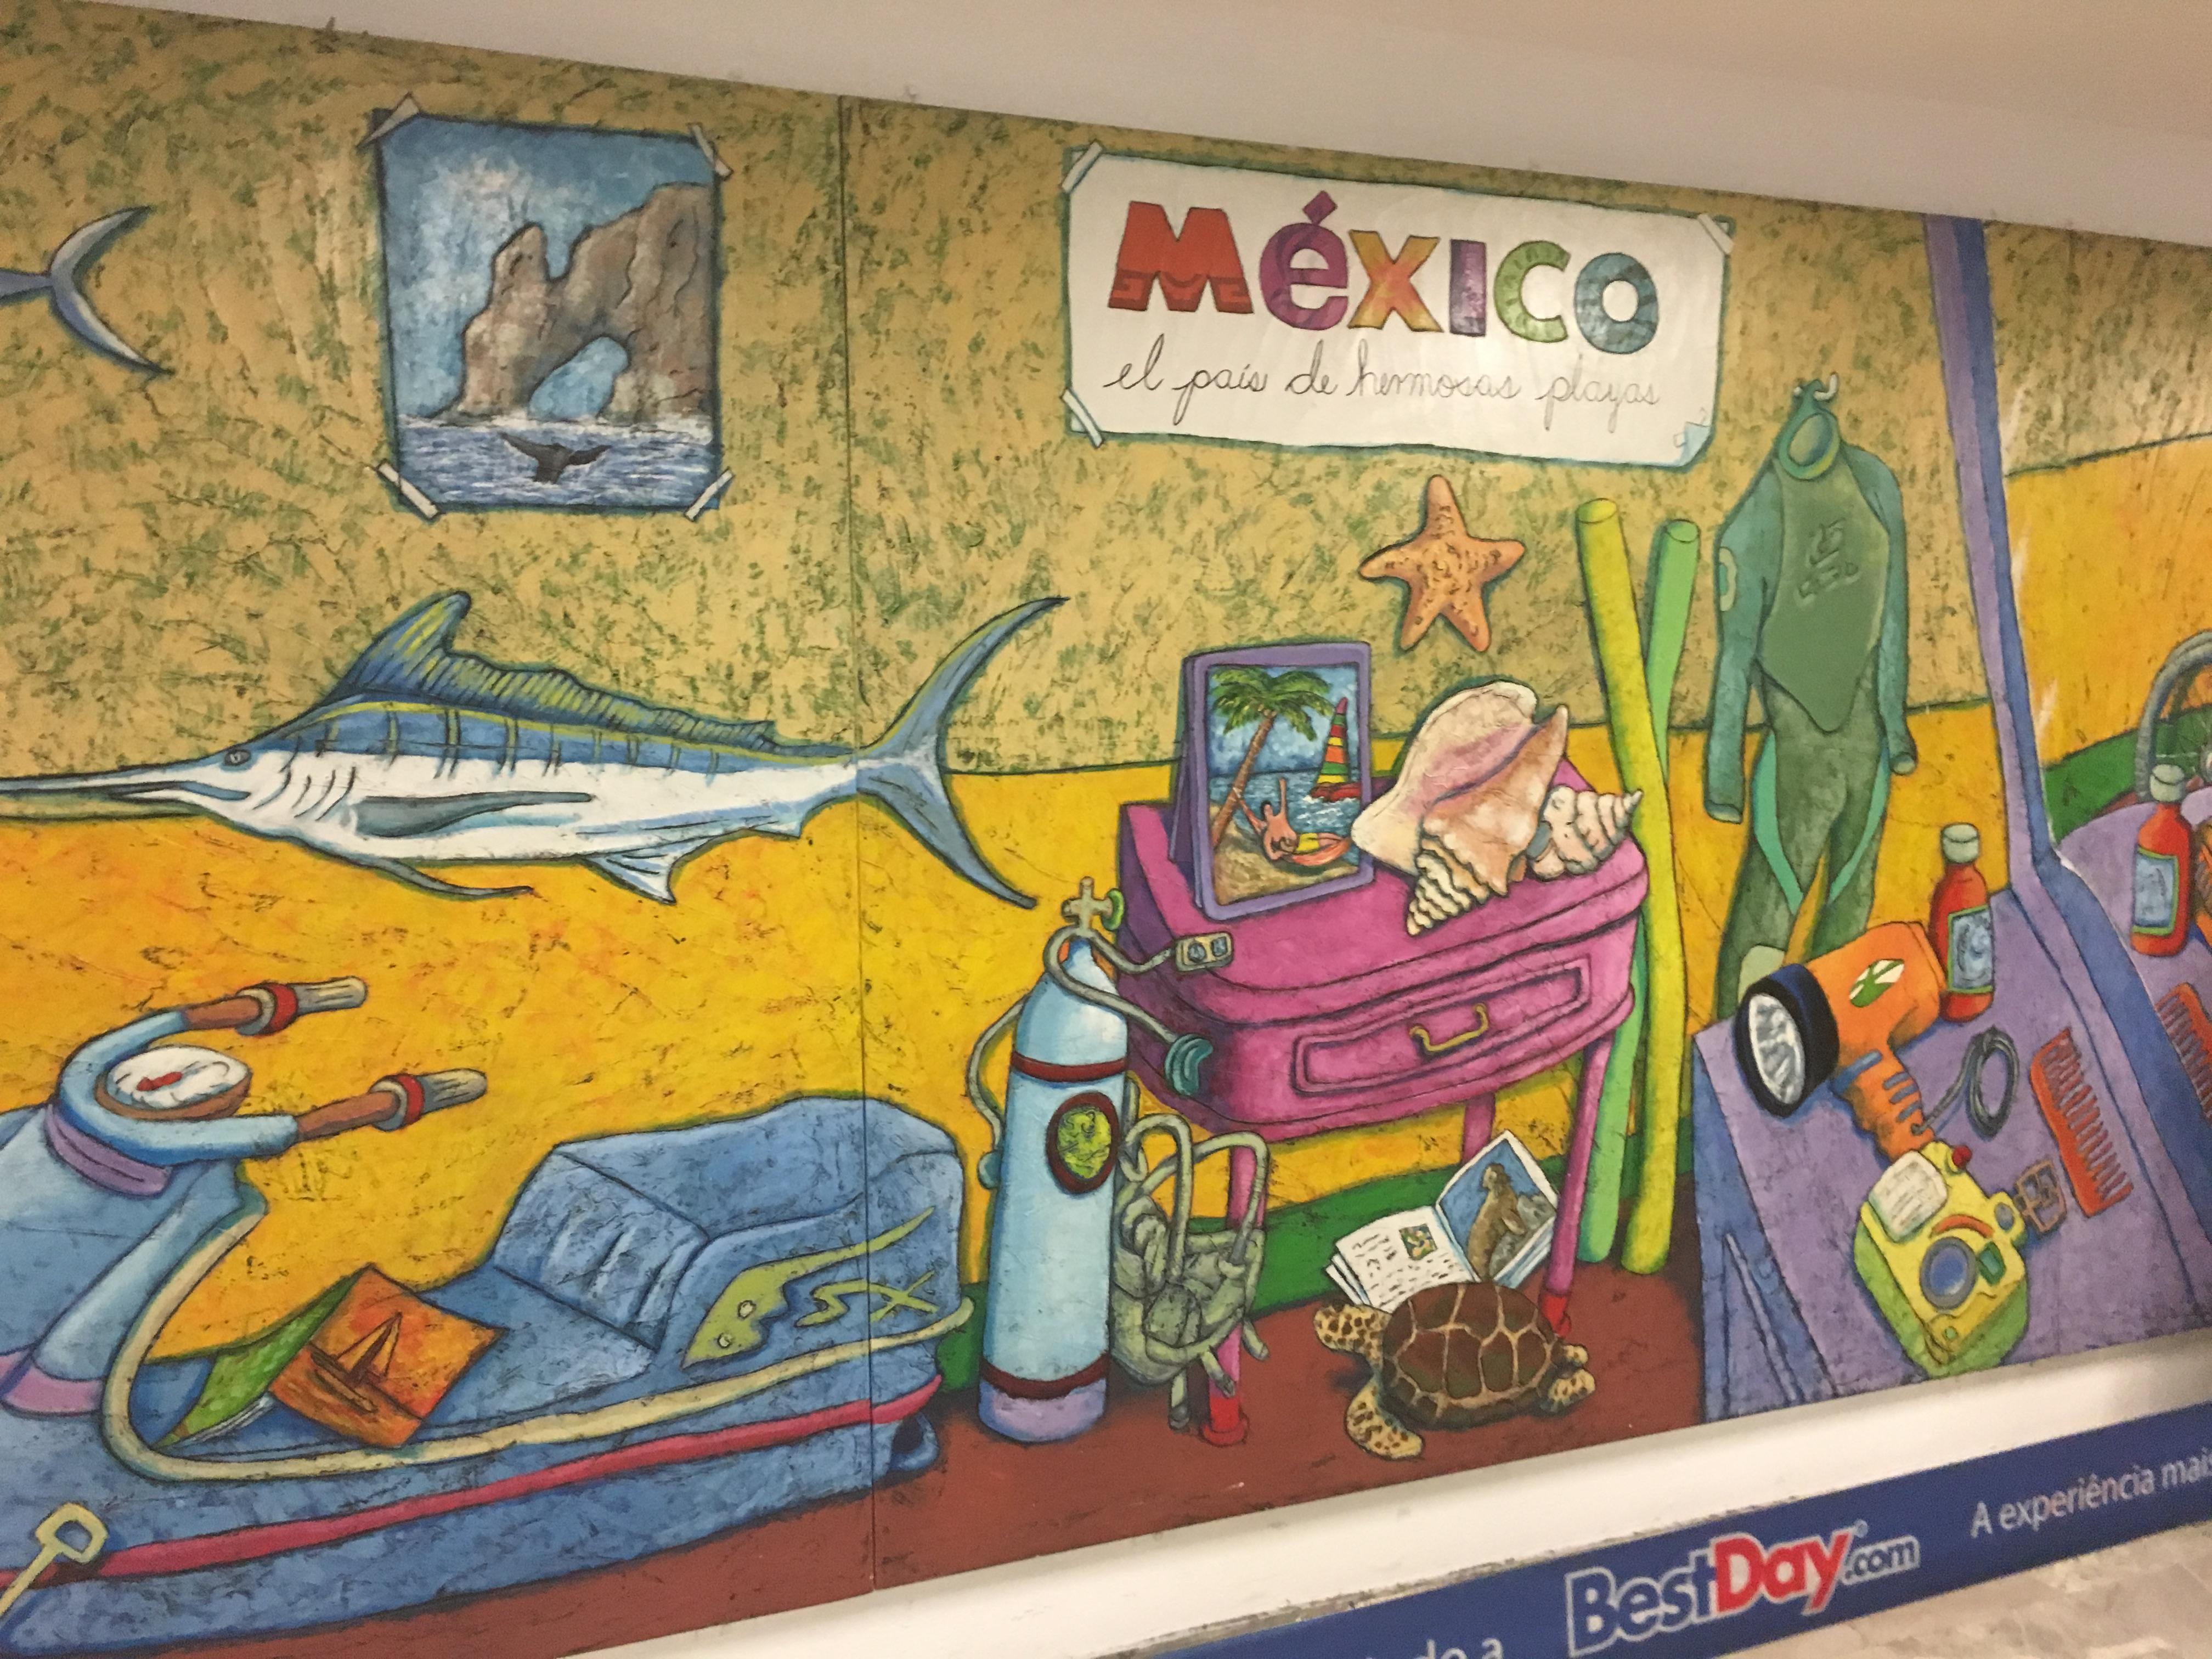 Mexico City Airport Customer Reviews | SKYTRAX